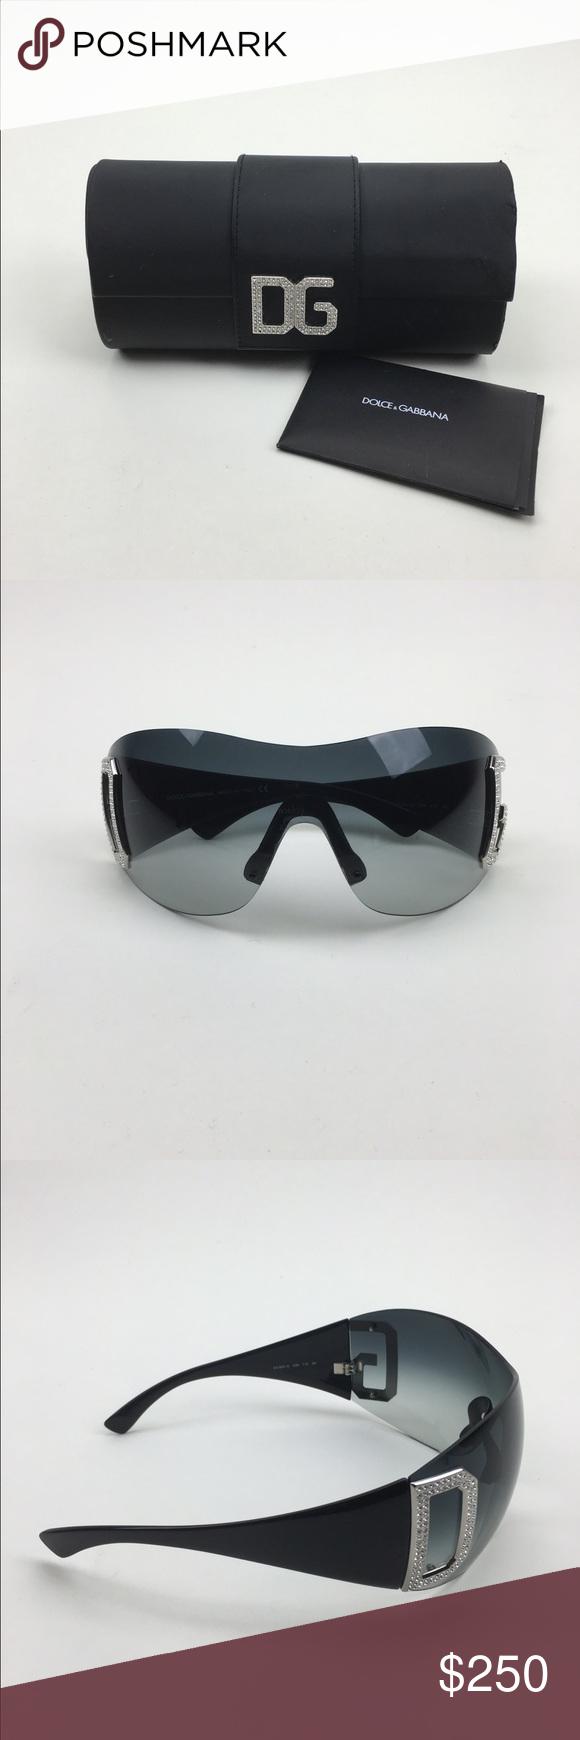 b6da92690b6 Dolce   Gabbana sunglasses Authentic Dolce   Gabbana sunglasses ...